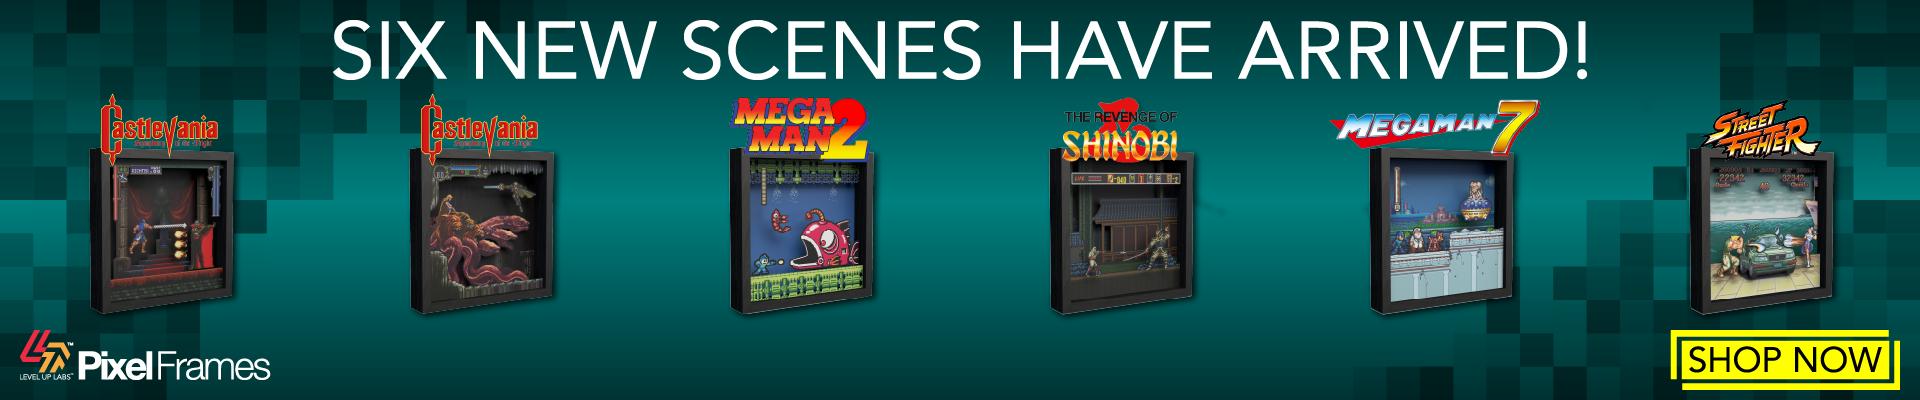 Pixel Frames - Six NEW scenes have arrived!